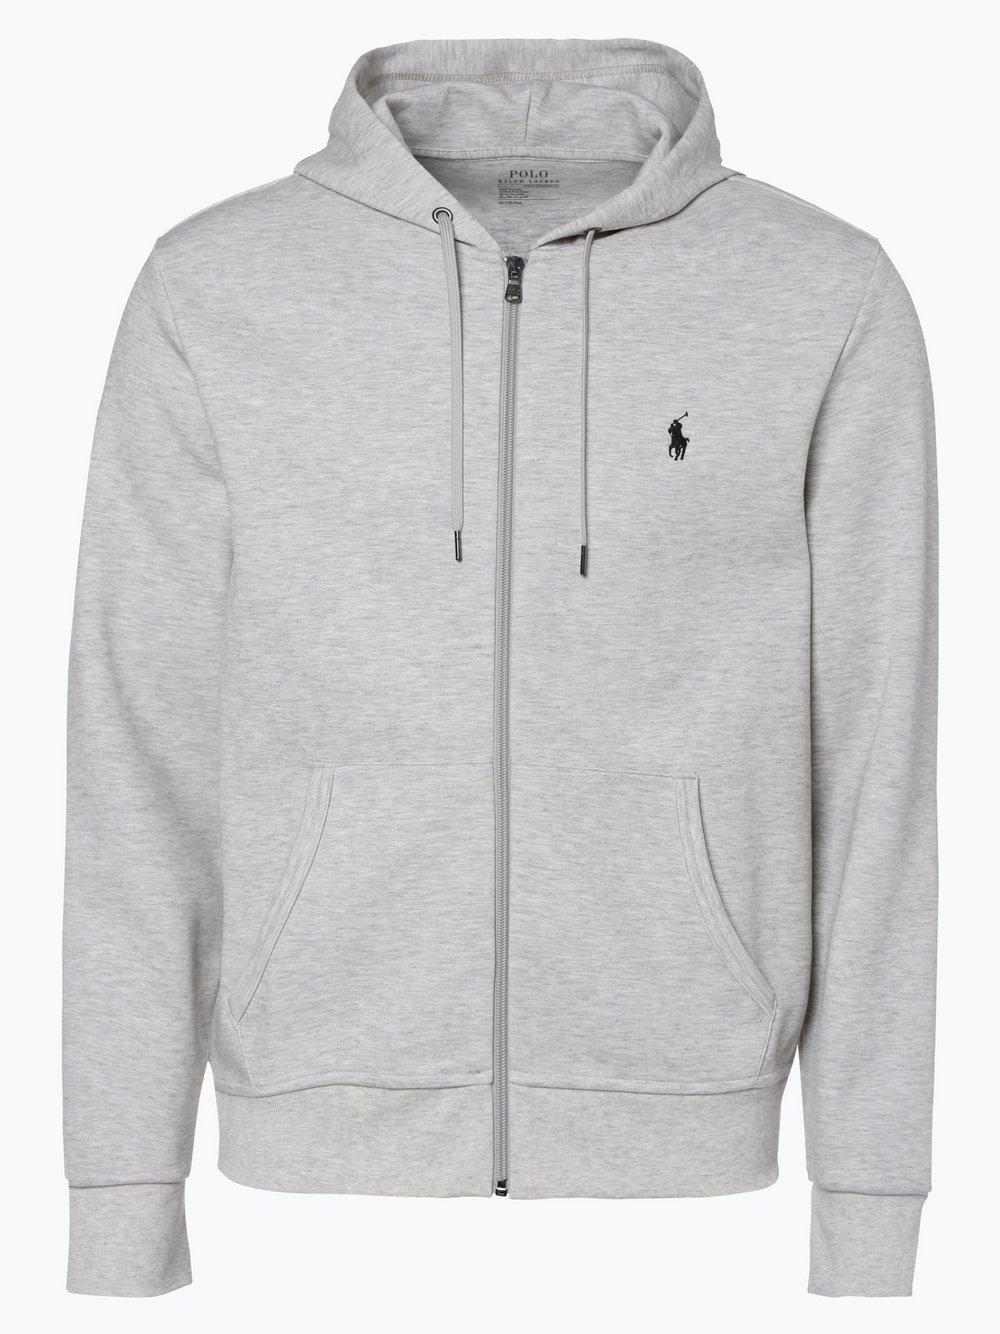 faed97f6a24 Polo Ralph Lauren Herren Sweatjacke grau uni online kaufen